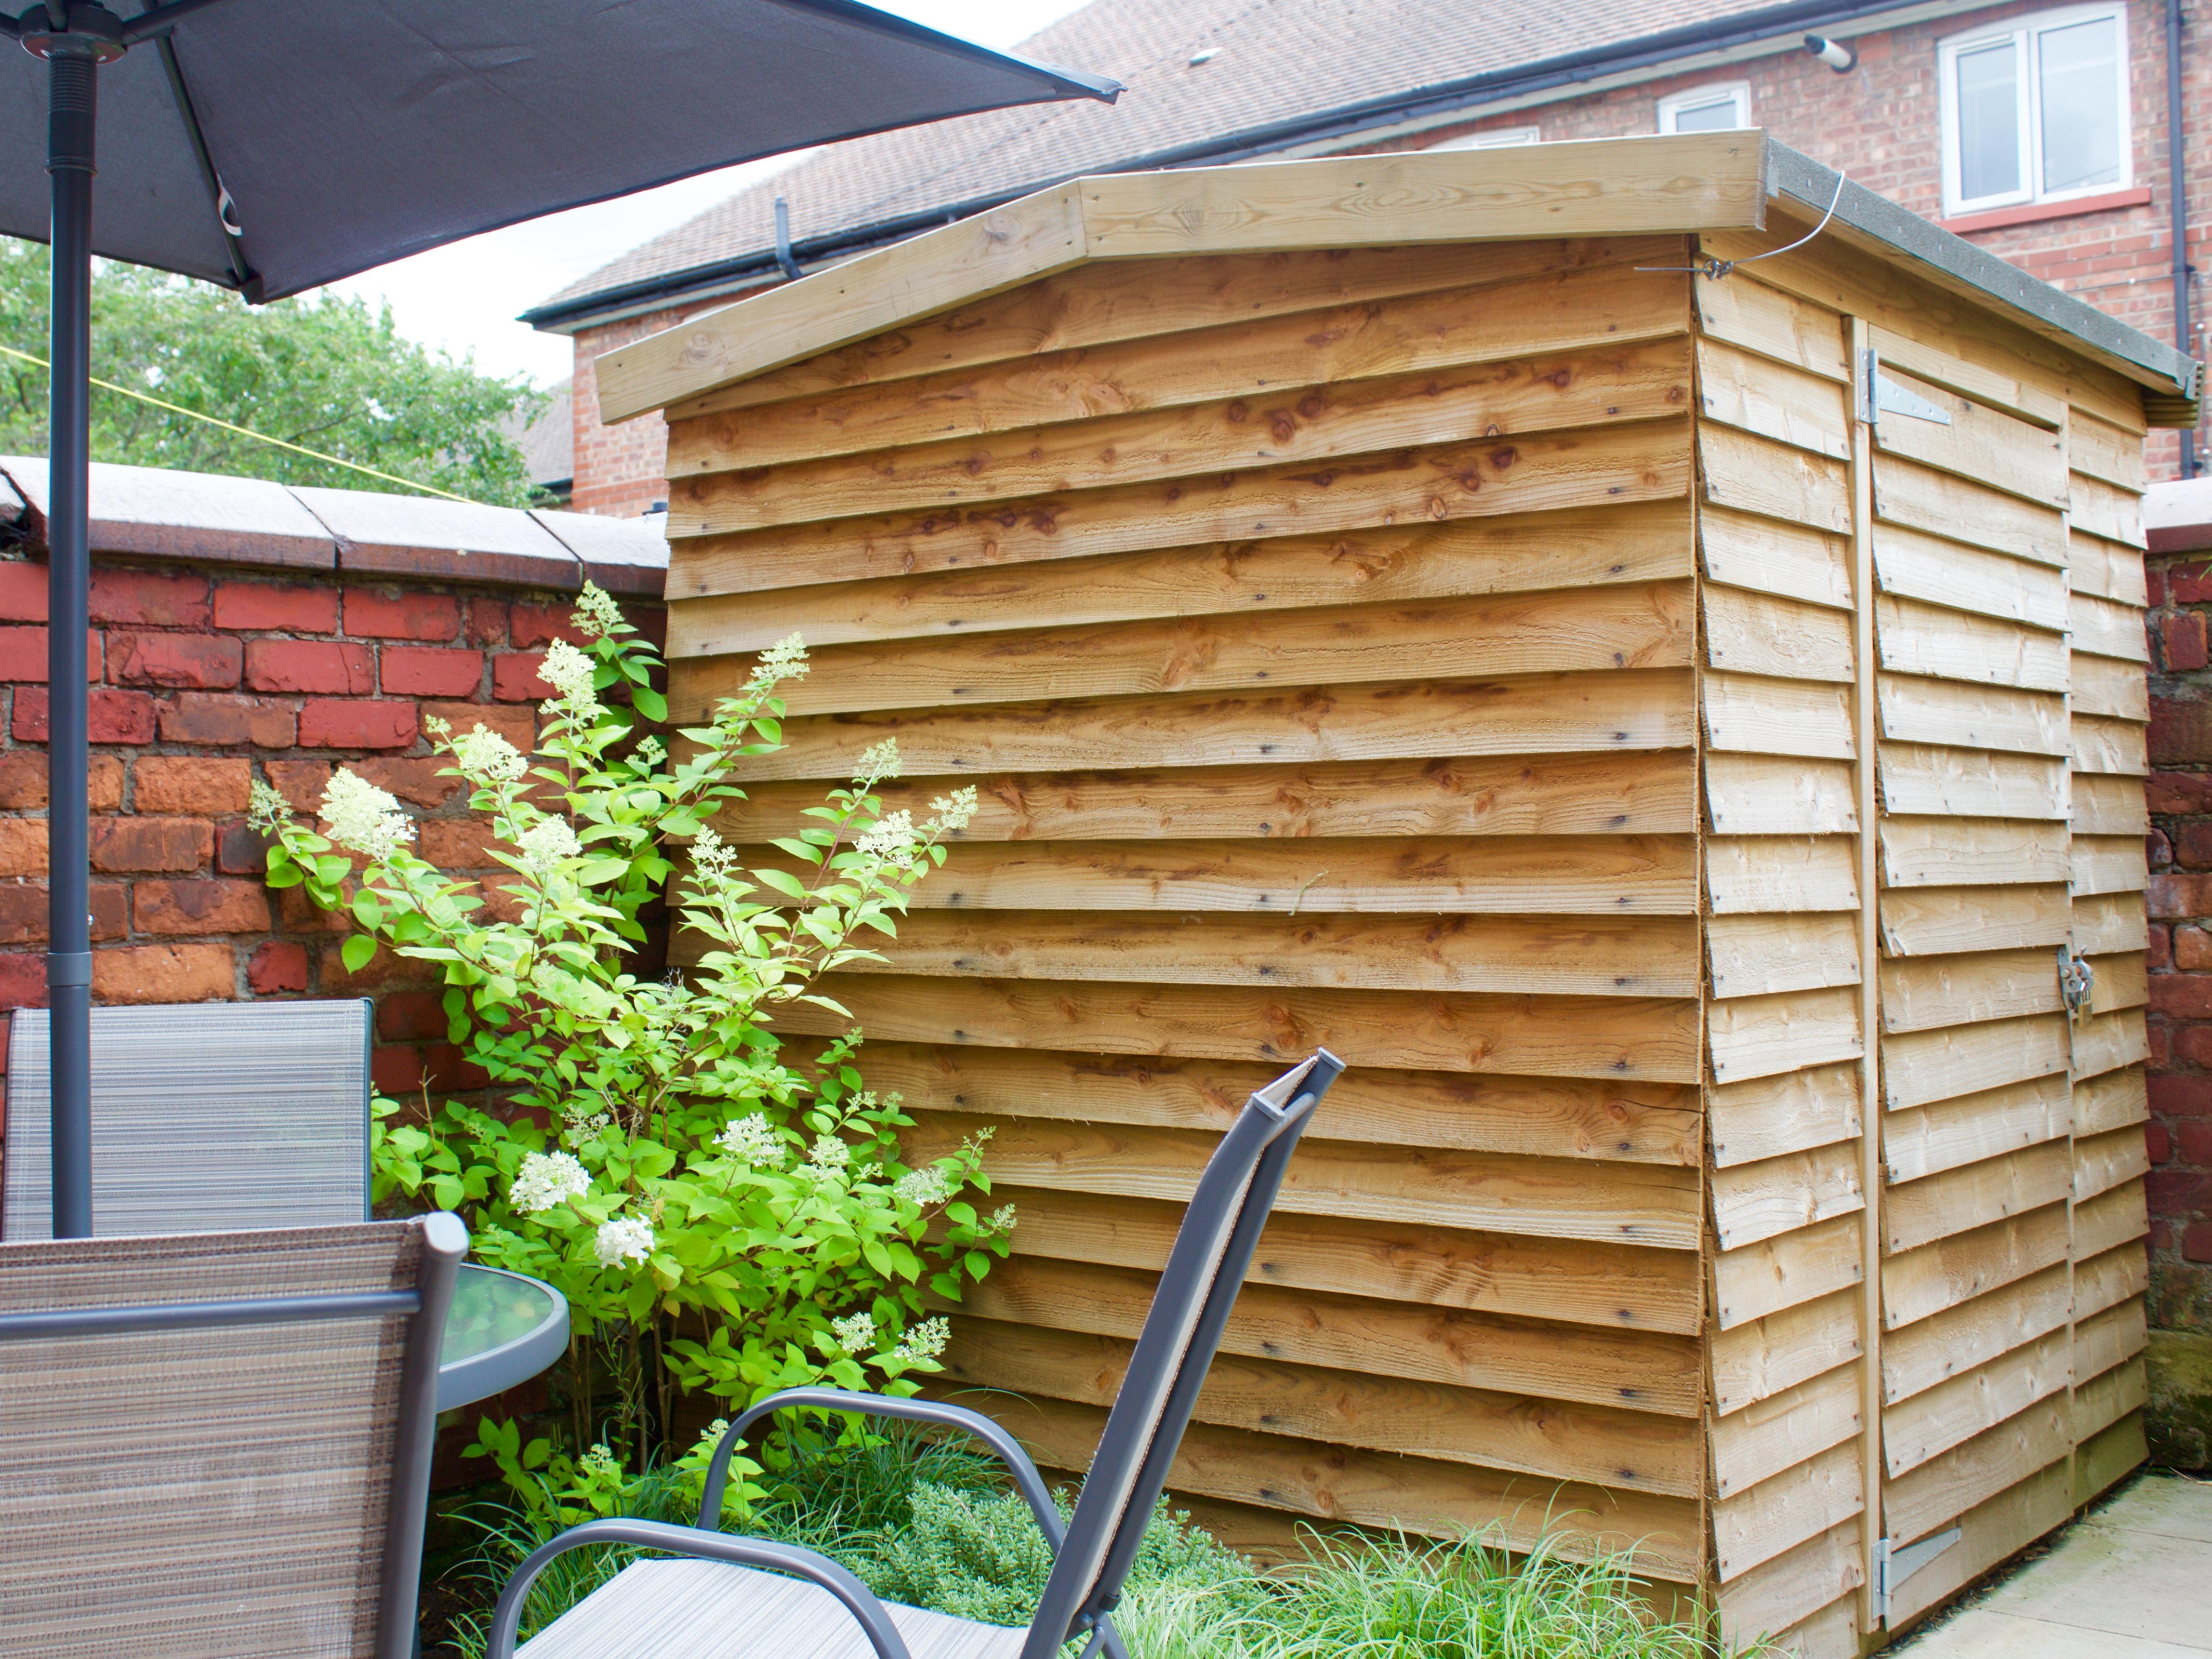 small courtyard garden design in manchester and cheshire, altrincham, didsbury, chorlton, wilmslow, alderley edge, sale, knutsford, stockport, lancashire, chester, 4